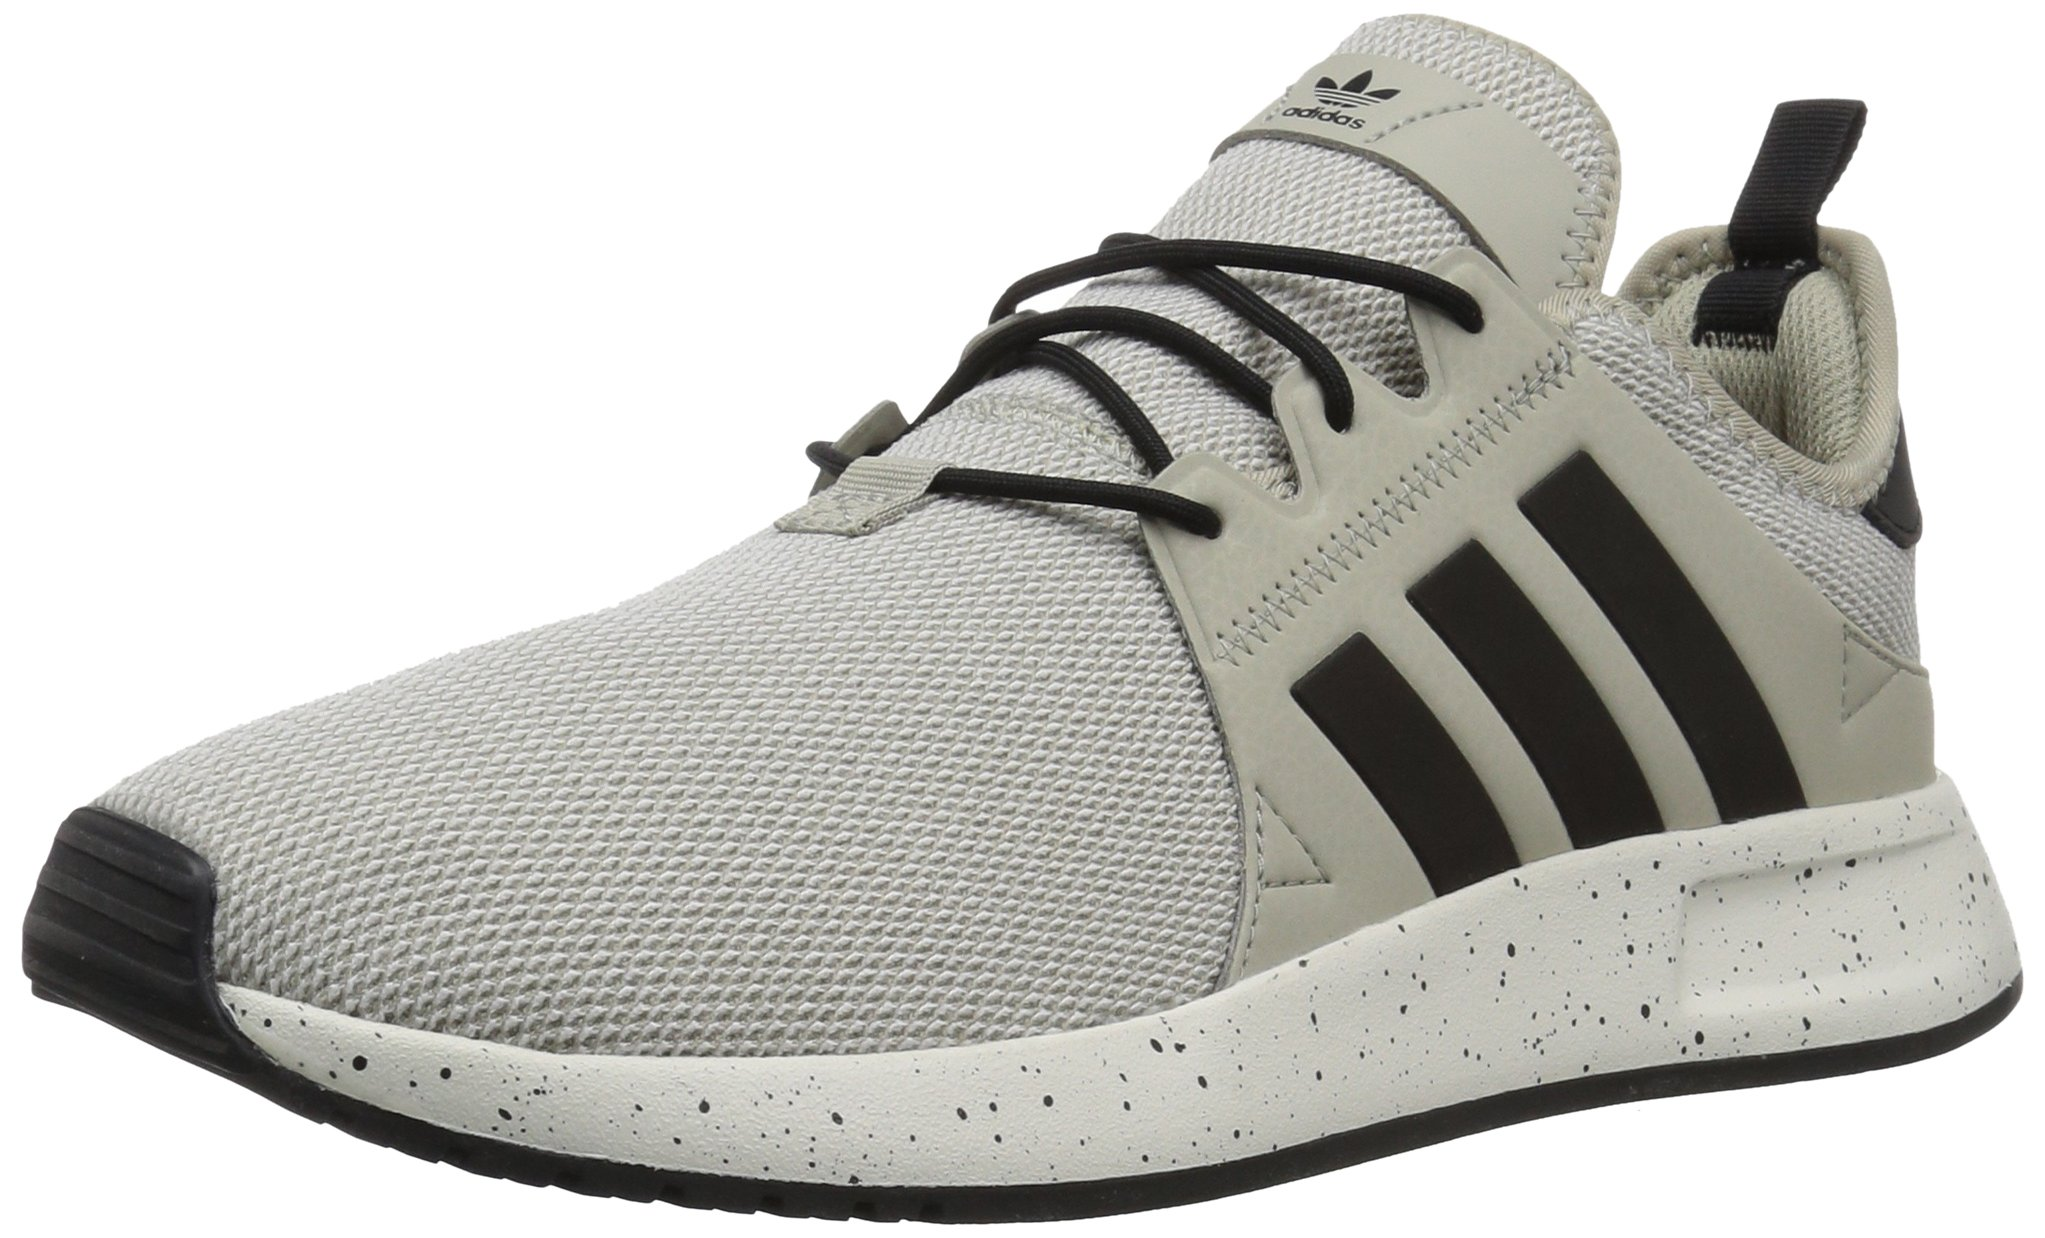 adidas Originals Mens X_PLR Running Shoe Sneaker Black/Sesame, 4 M US by adidas Originals (Image #1)